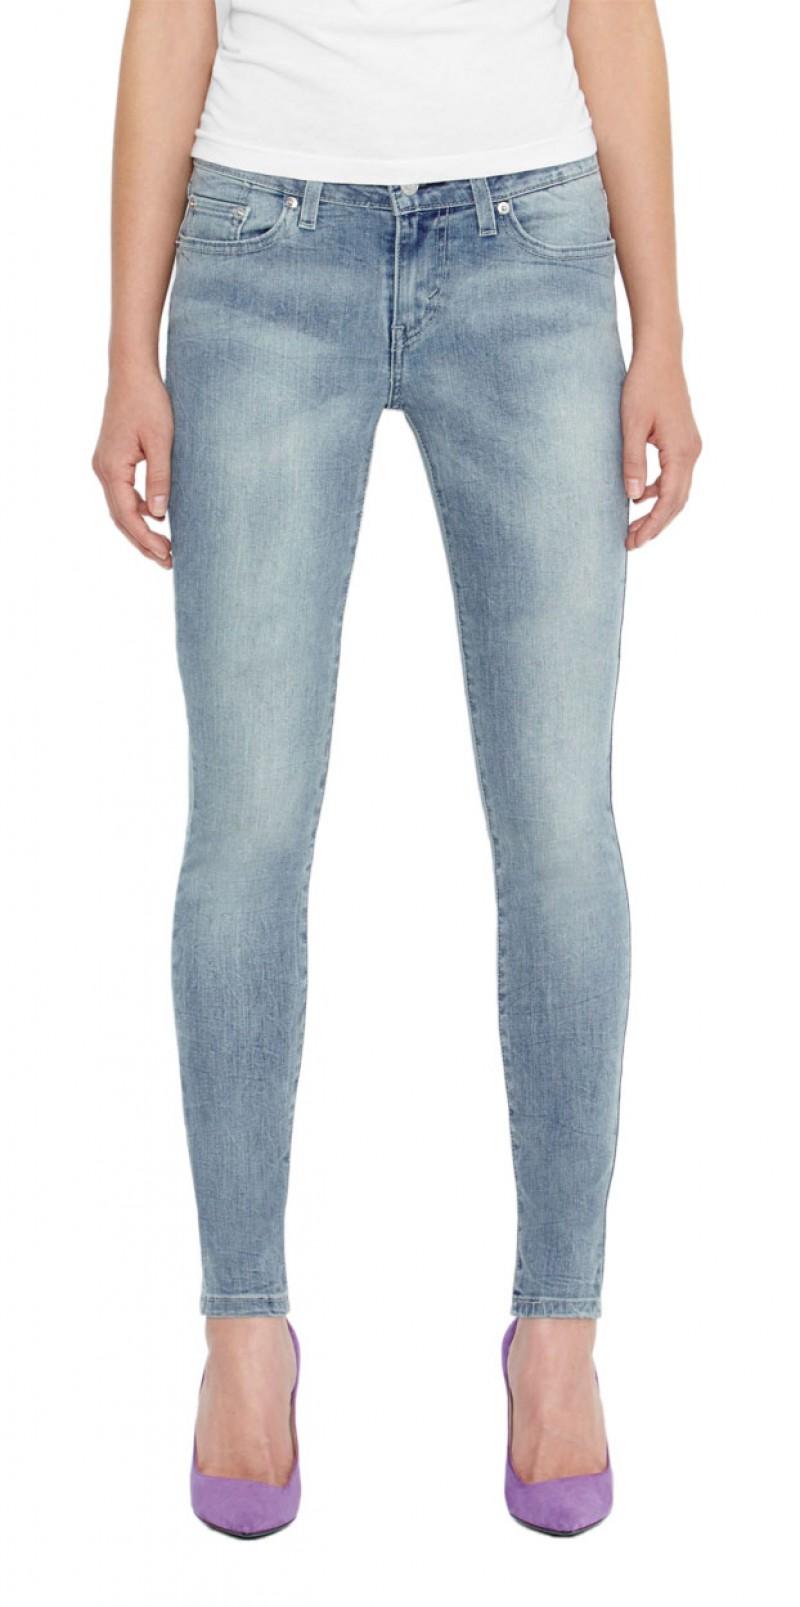 Levis Legging Jeans - Skinny Fit - Century